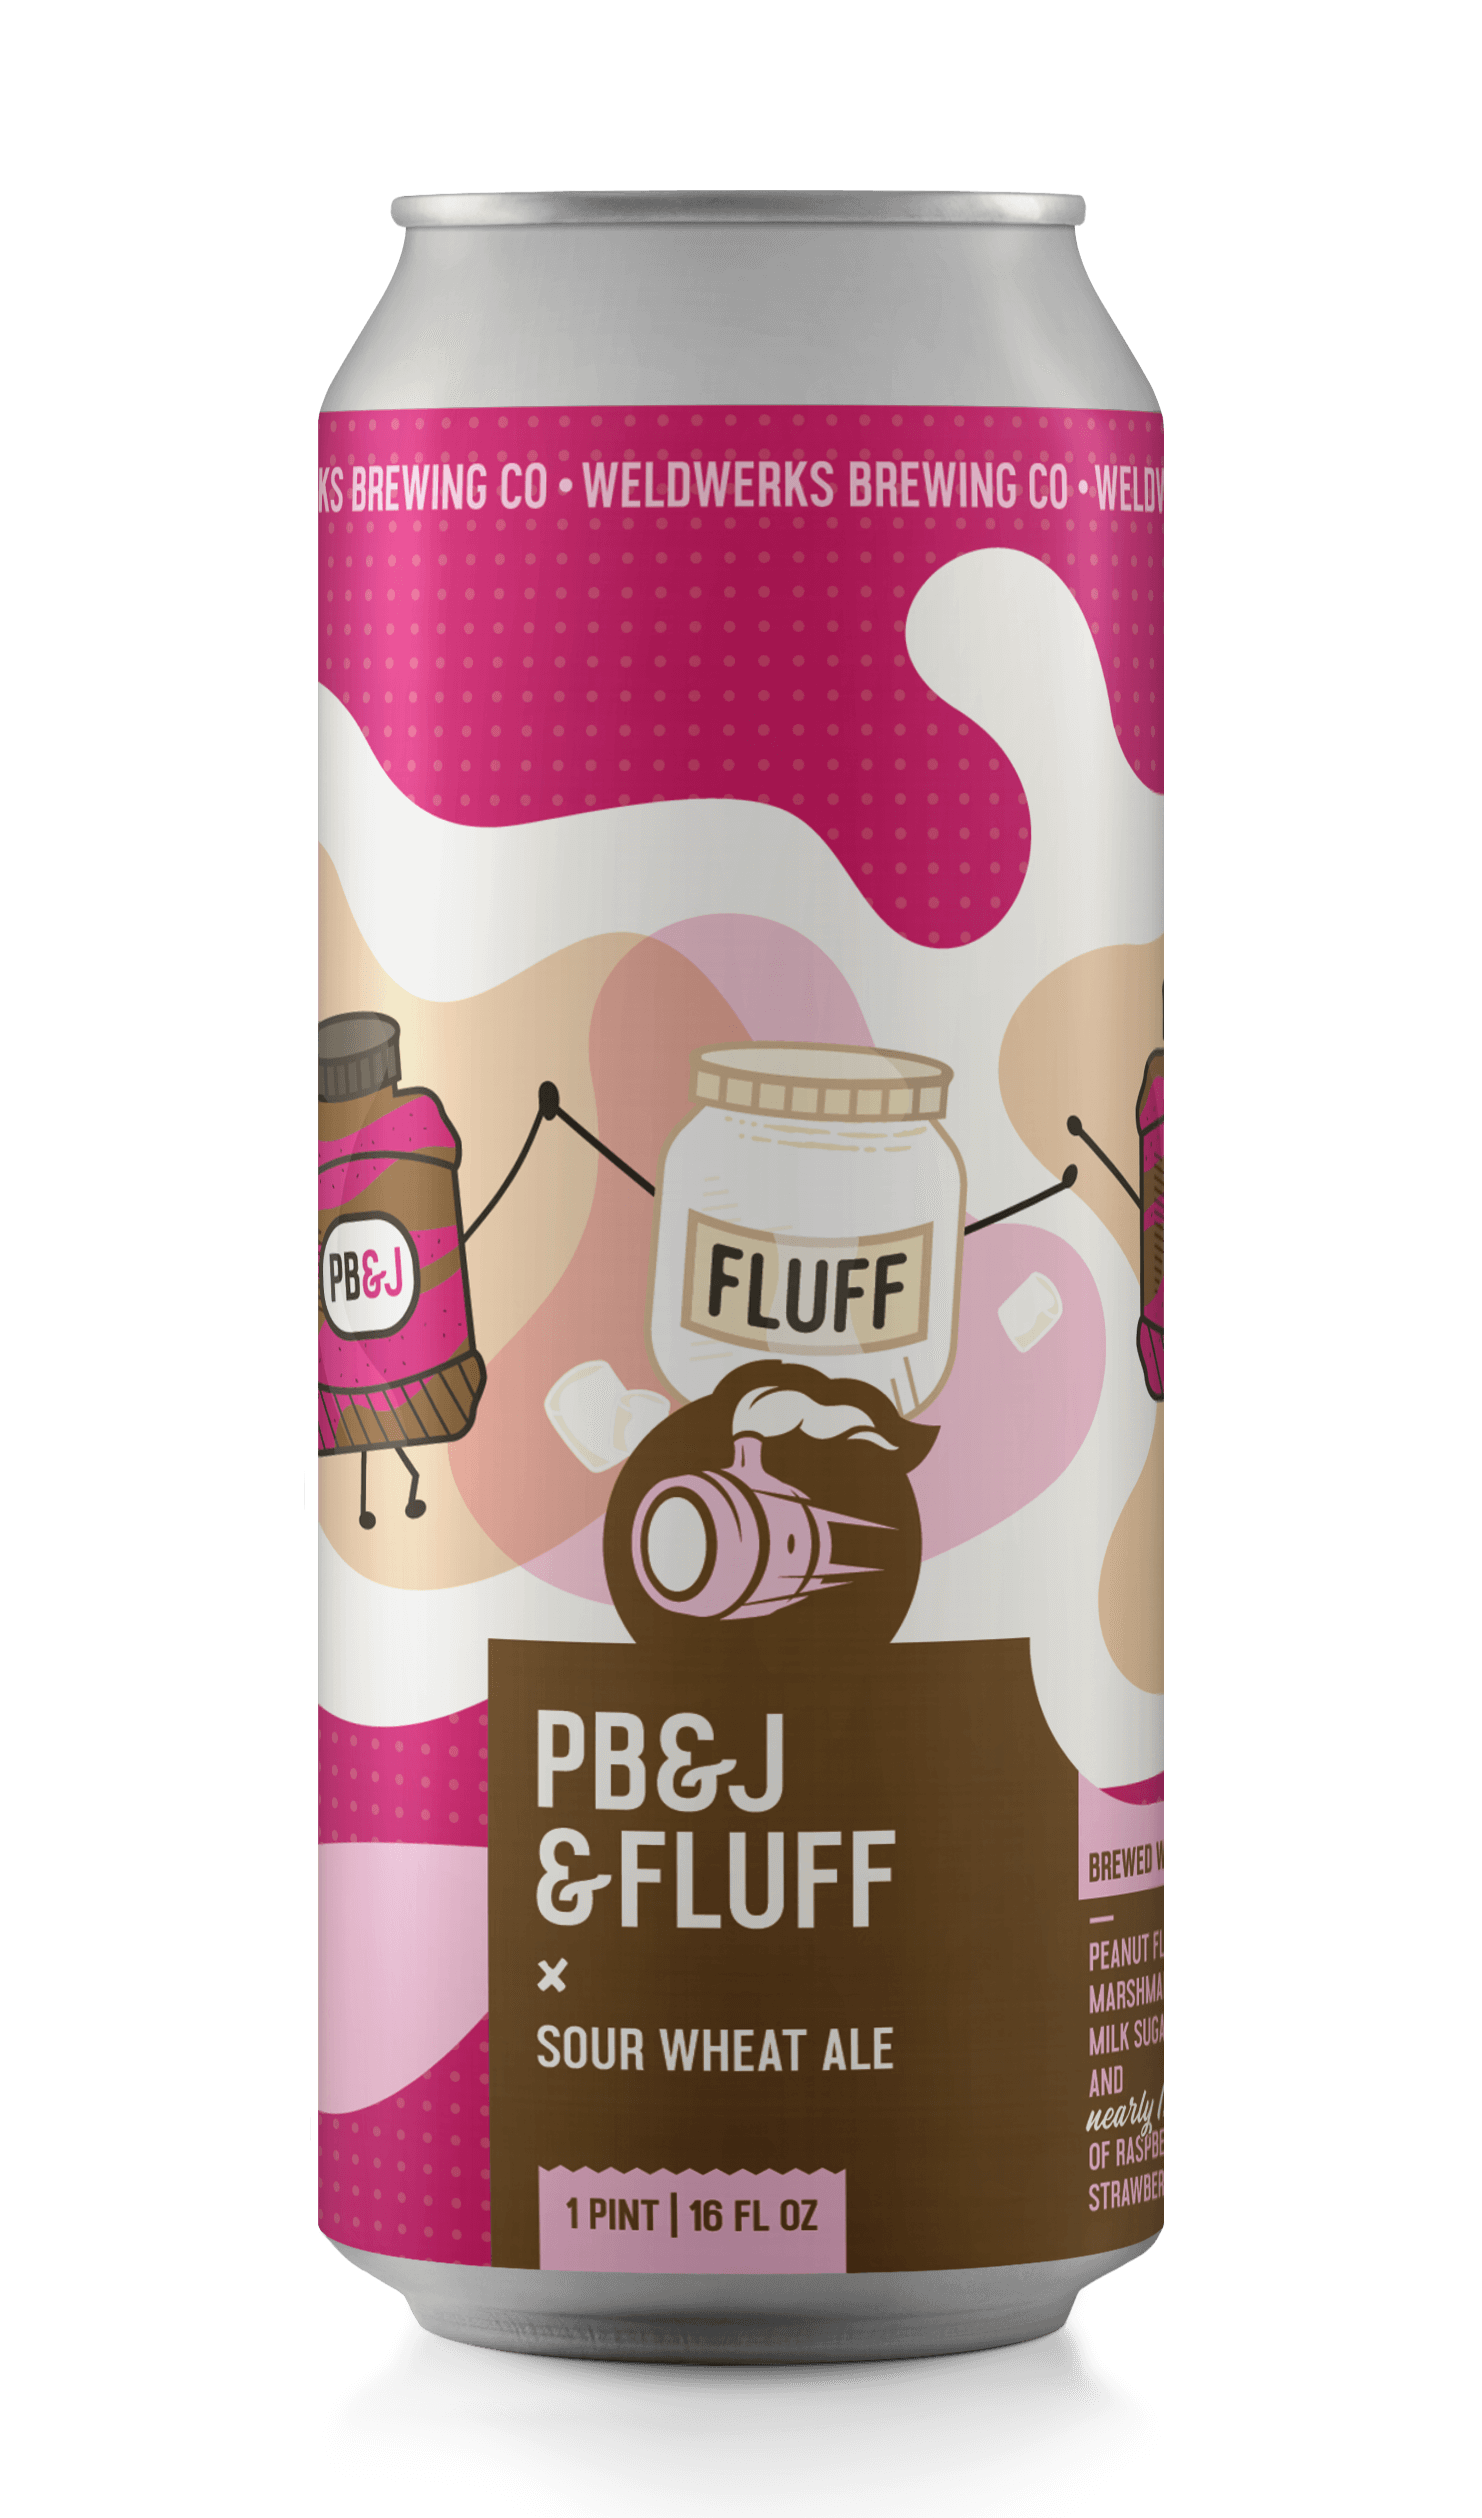 PB&J & Fluff